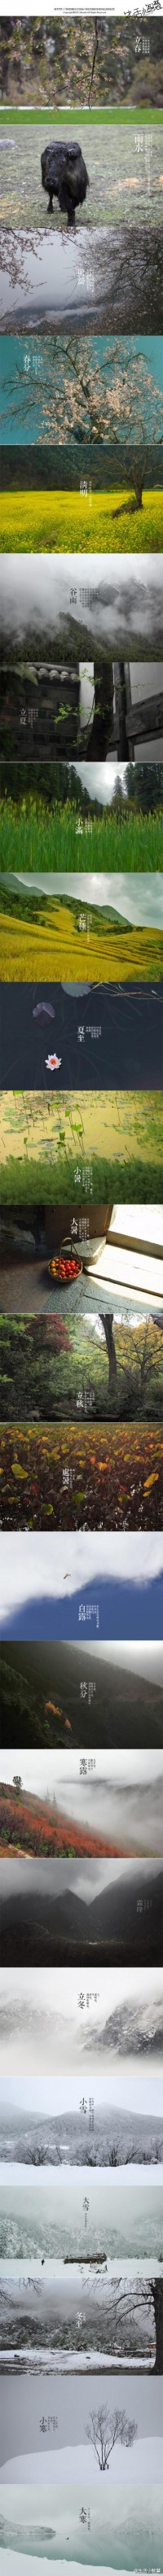 taozhedong的采集 - 季节的转动,有了这些照片,我才...